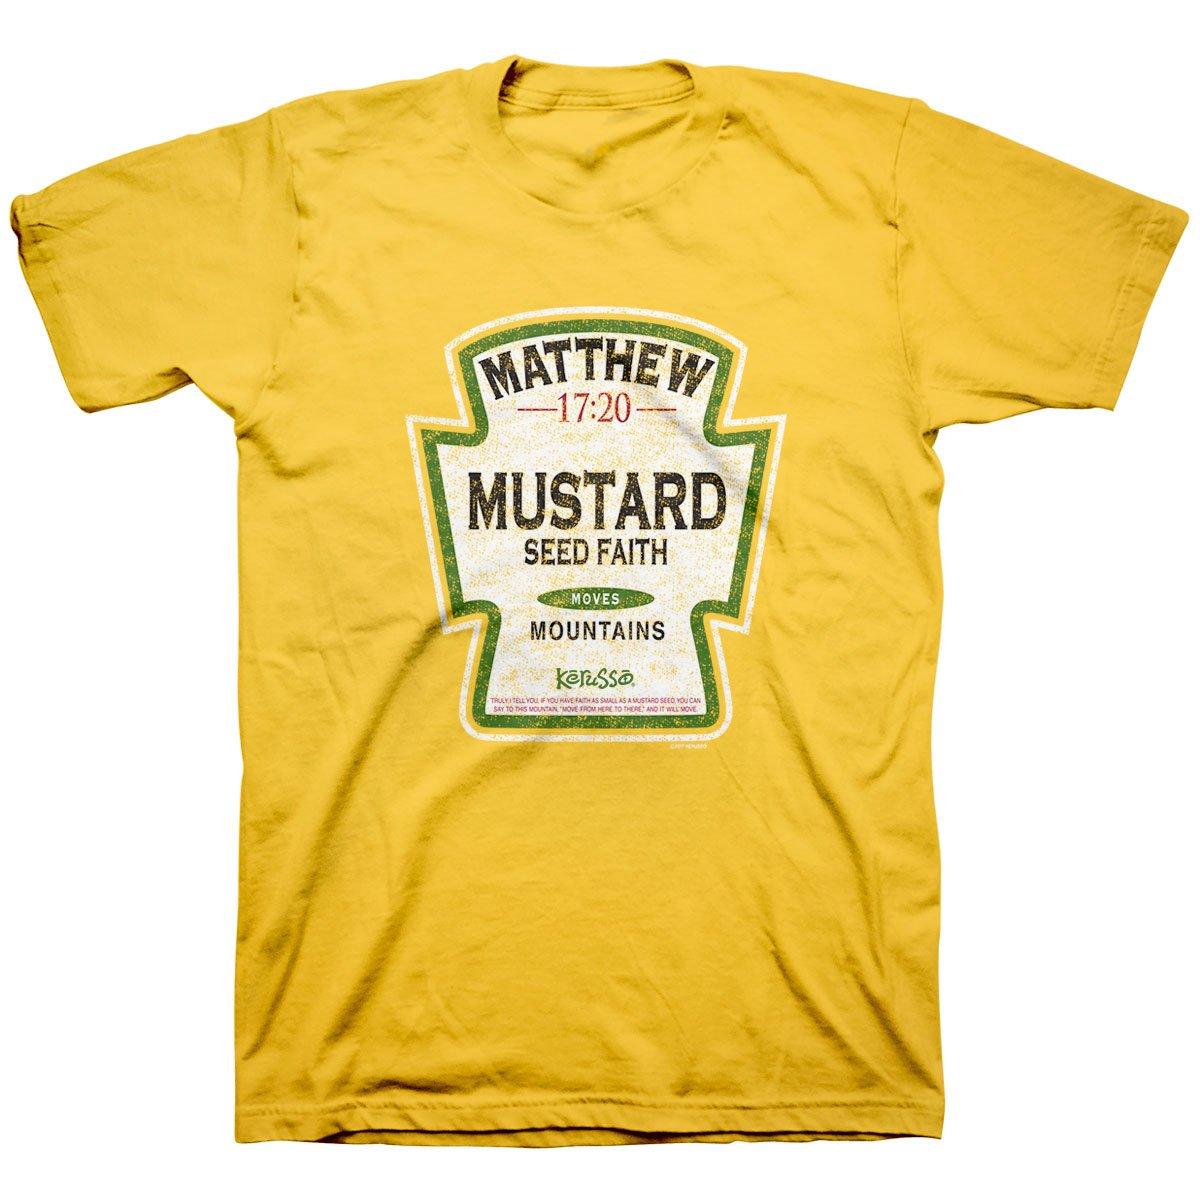 Mustard Seed Faith Moves Mountains Christian T-Shirt